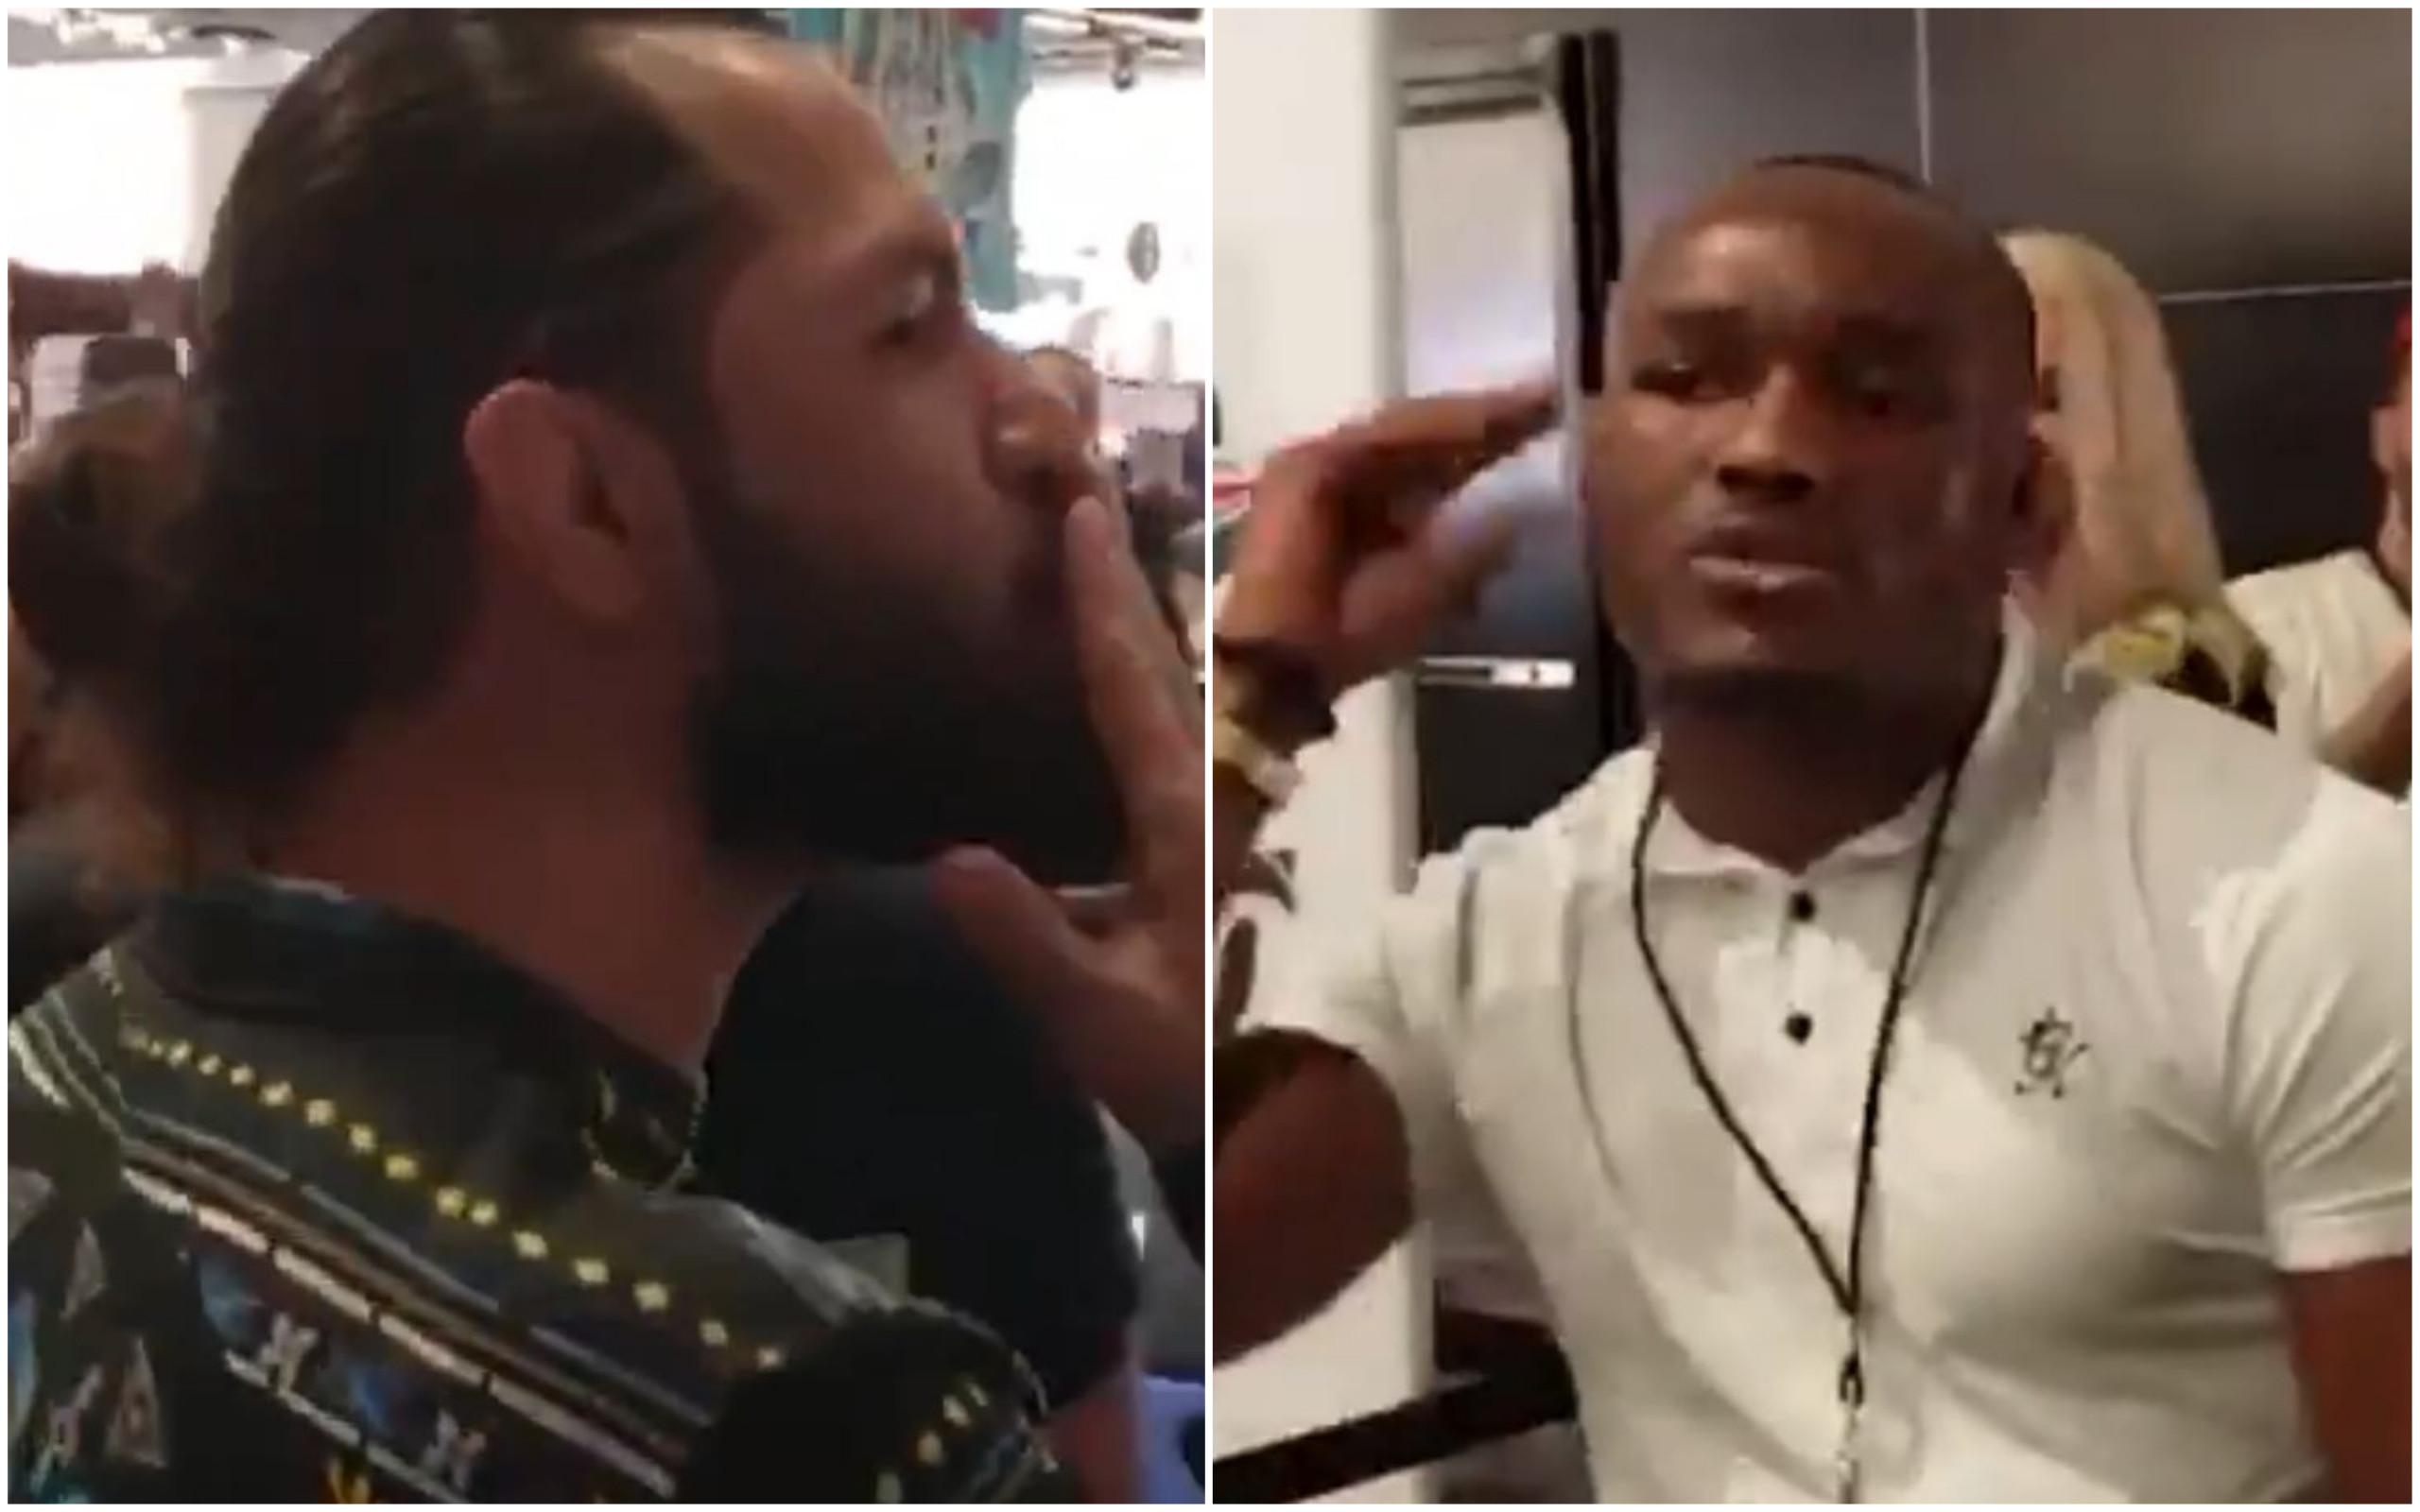 (VIDEO) Vezi confruntarea dintre Kamaru Usman si Jorge Masvidal! Urmeaza lupta?